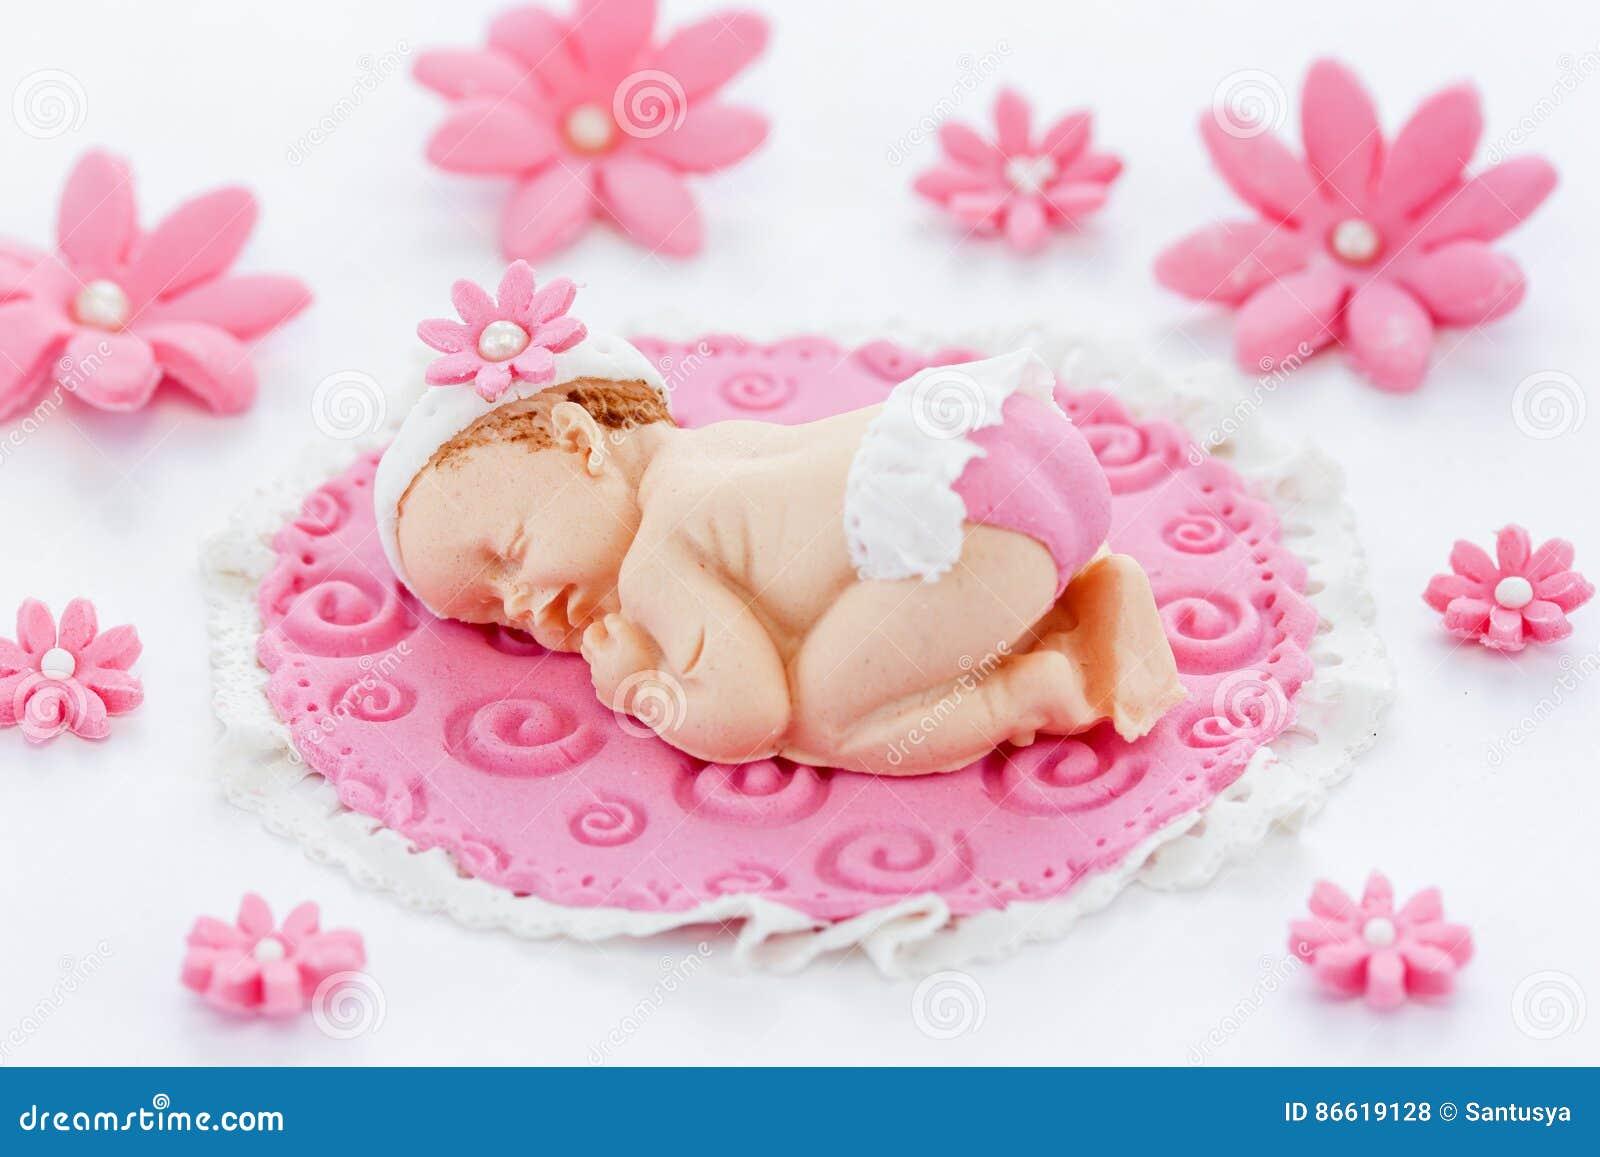 Baby shower cake topper fondant edible pink baby shower baby gir